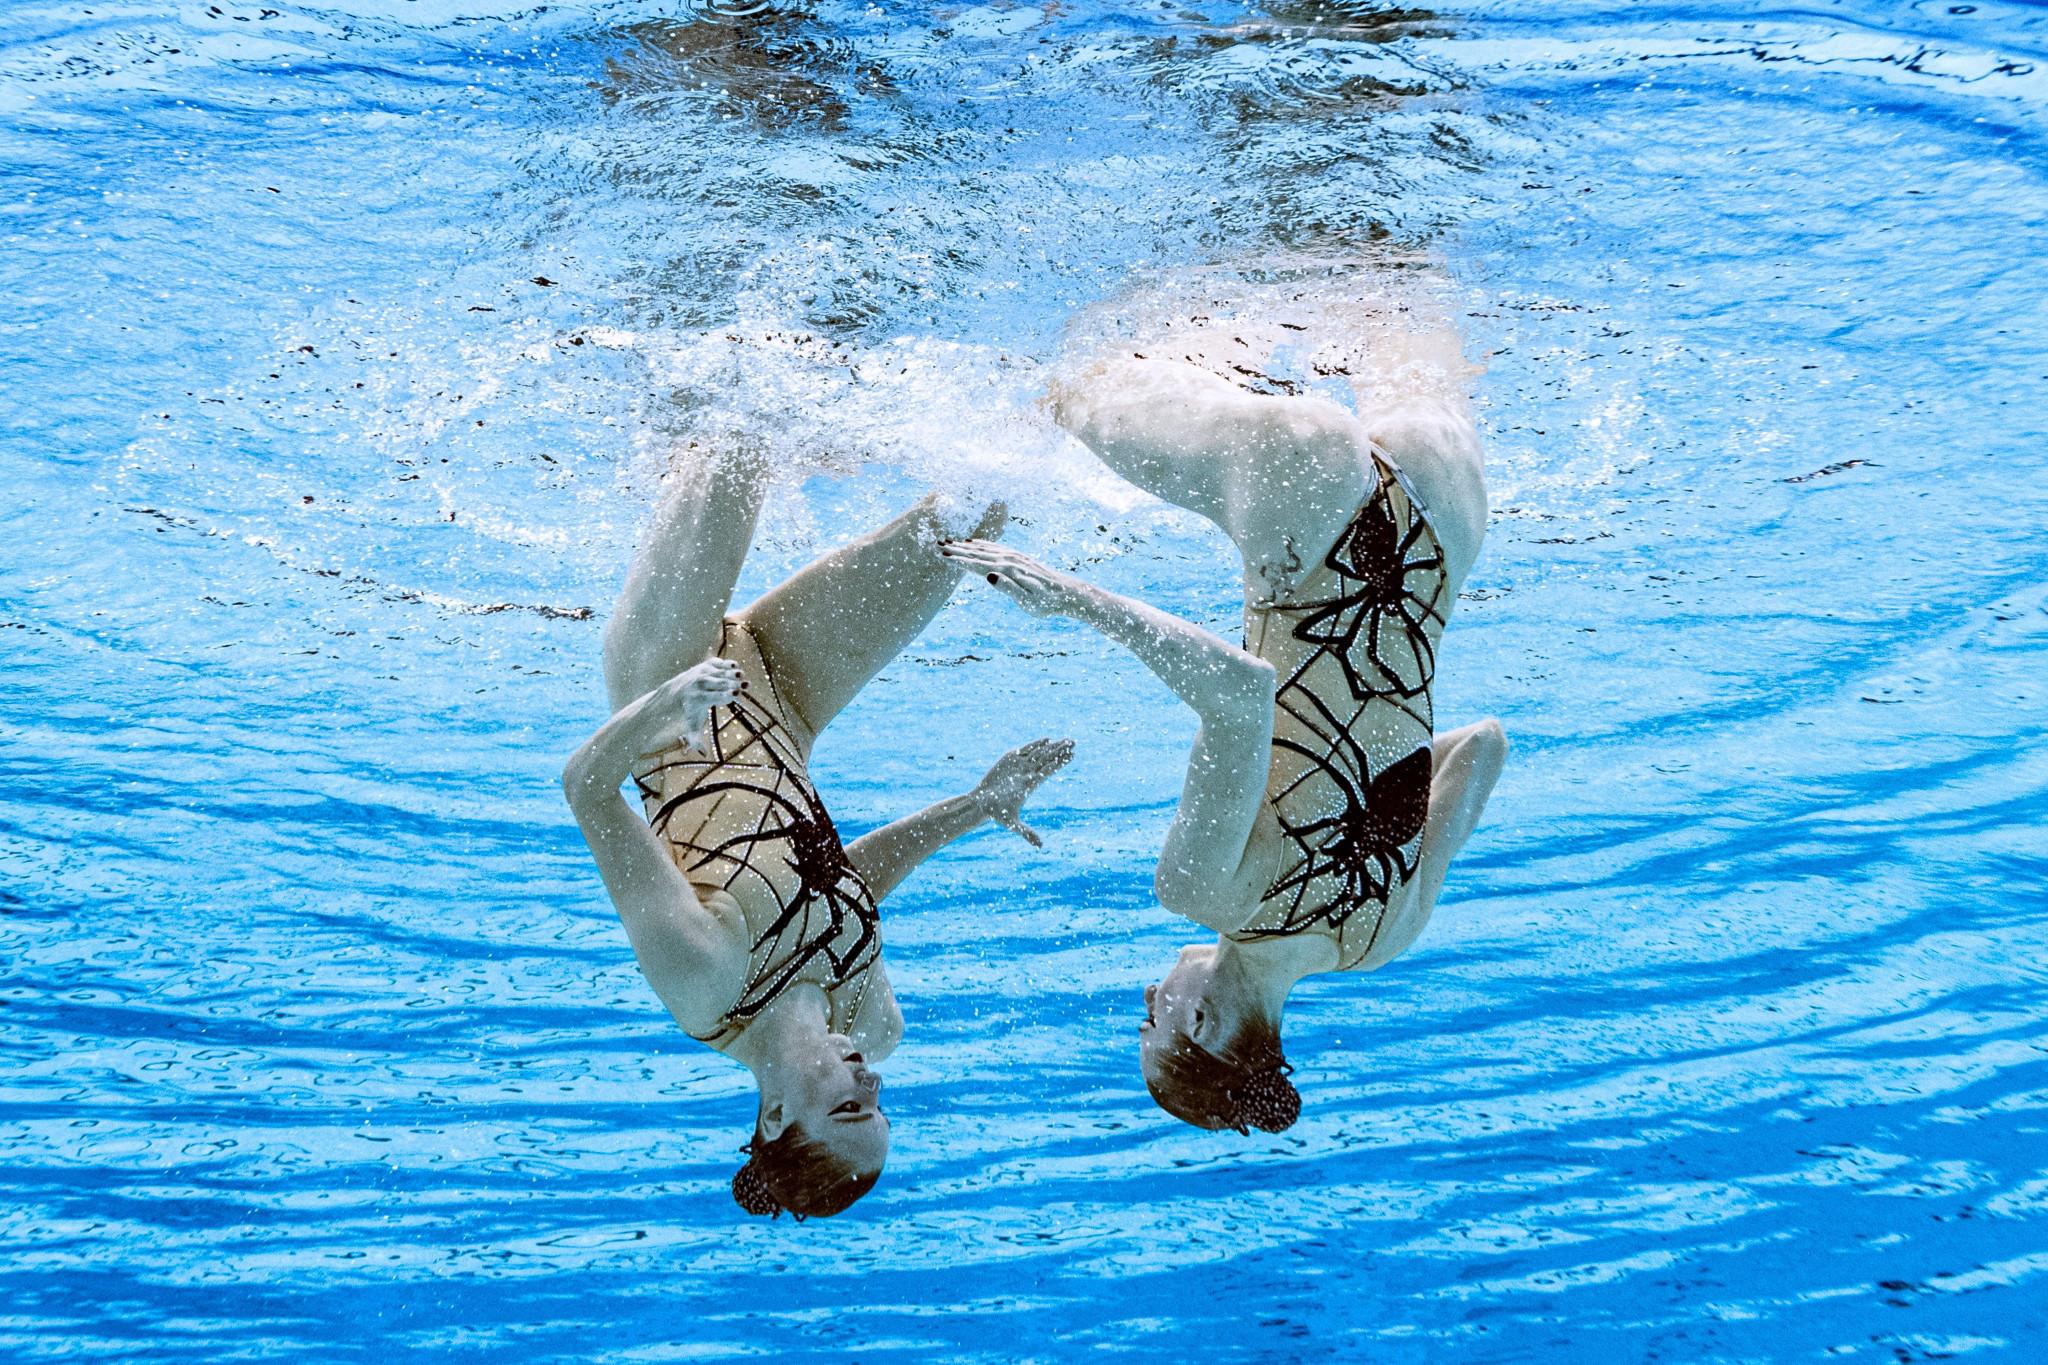 ROC artistic swimming world champions Kolesnichenko and Romashina win Tokyo 2020 duet gold